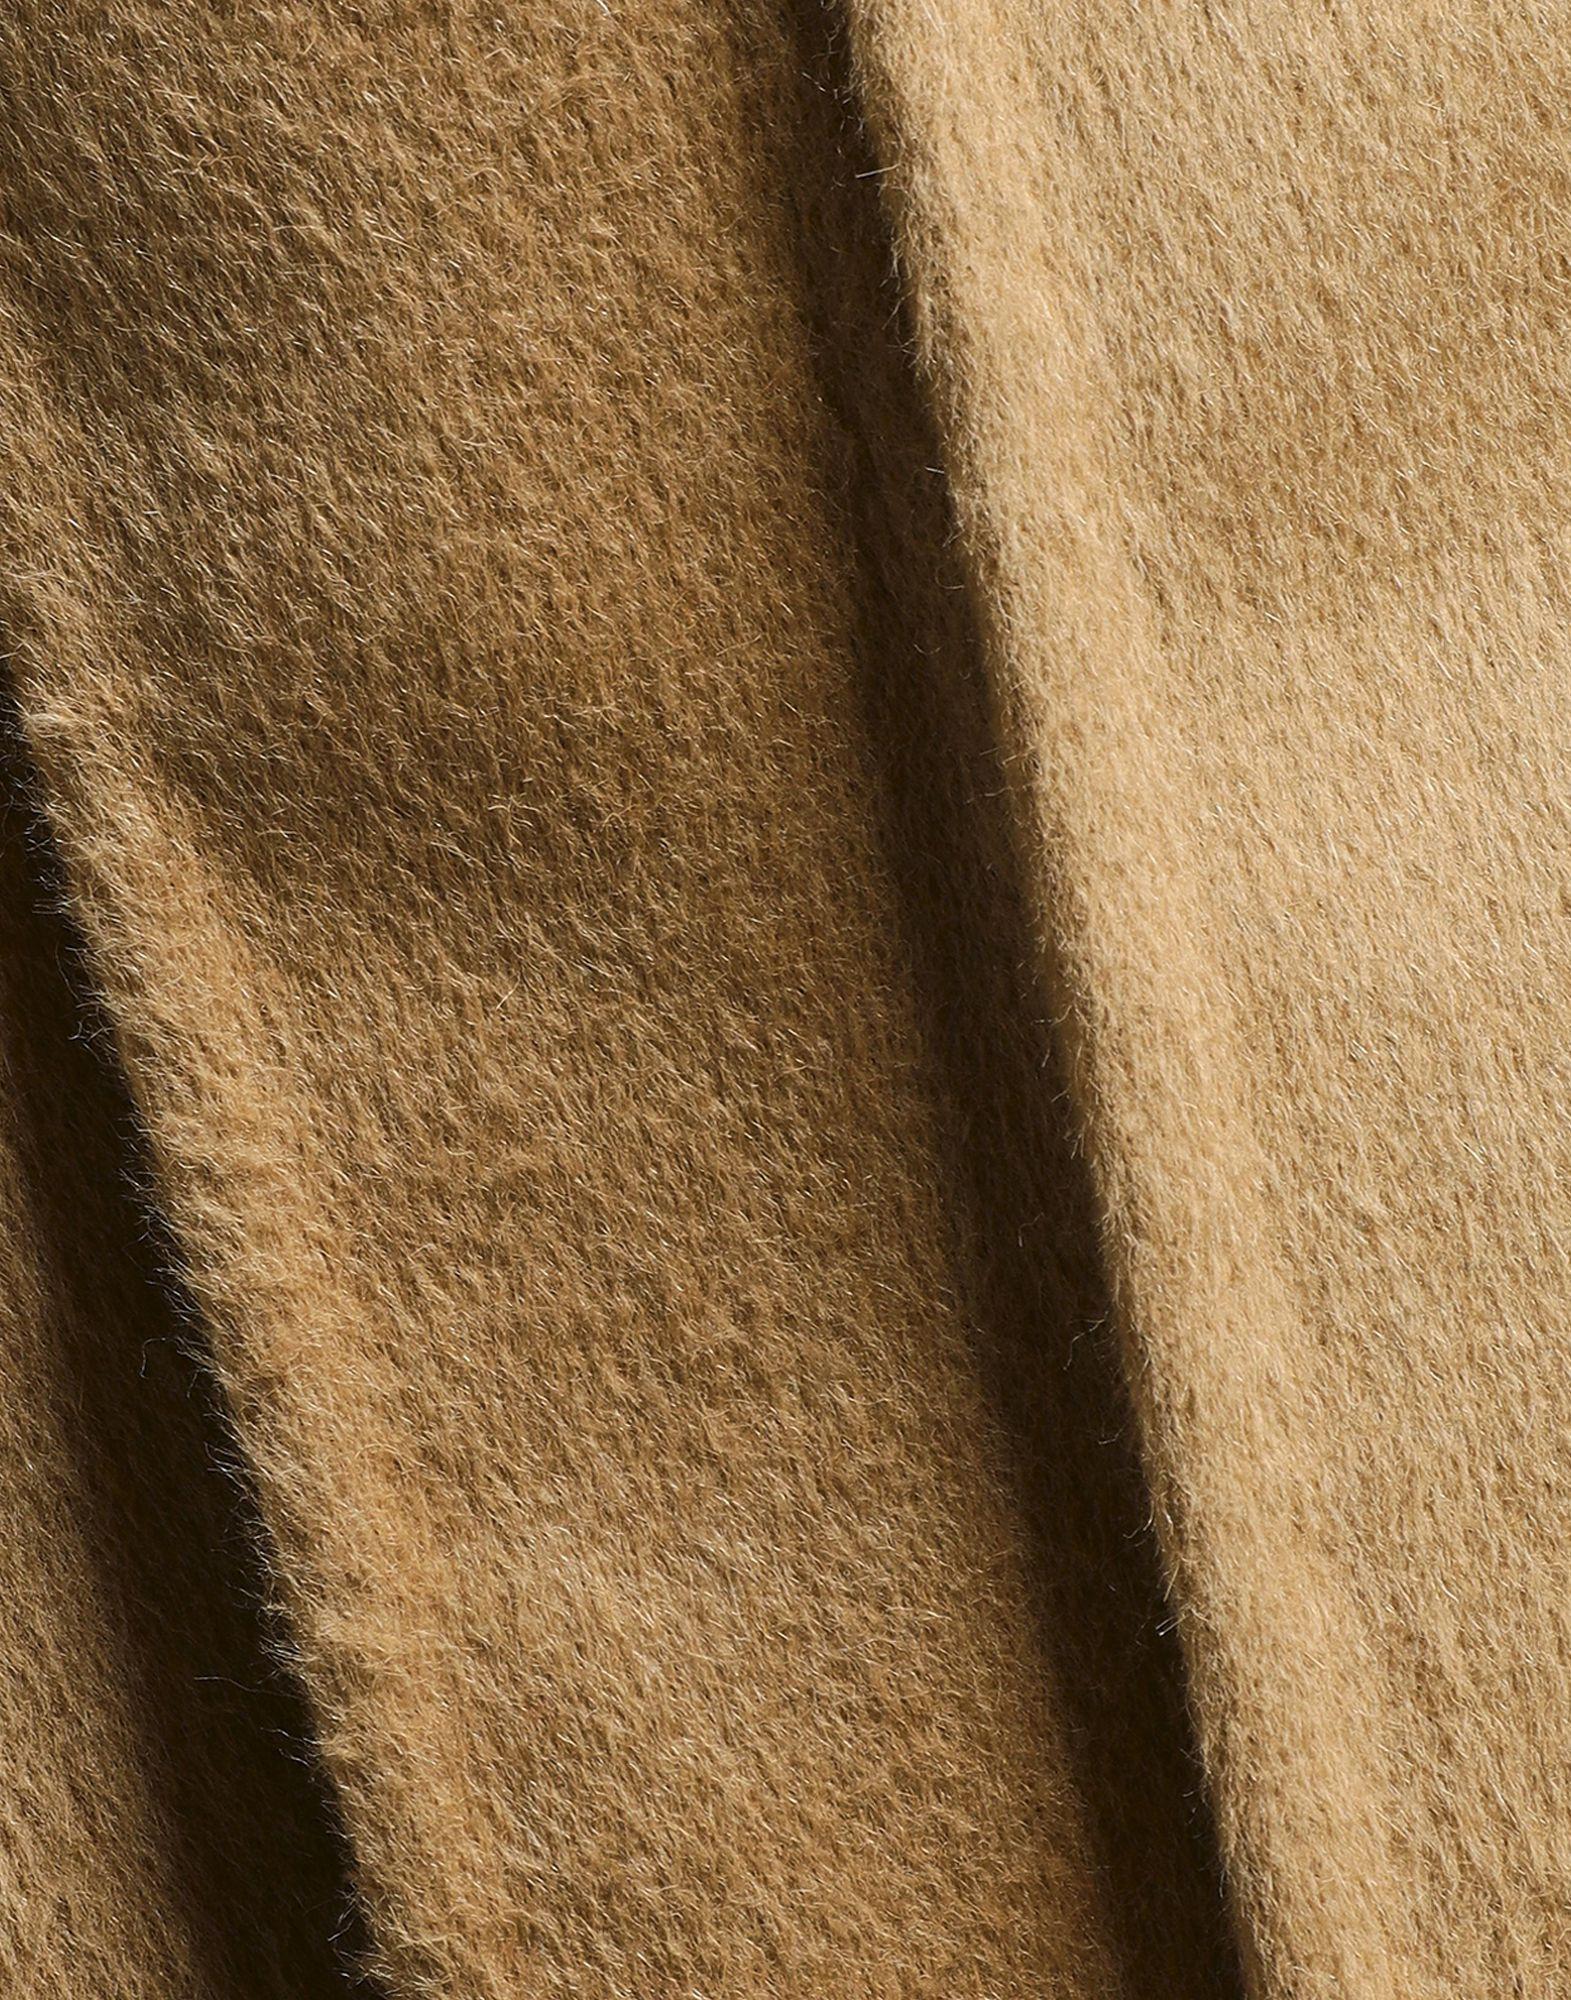 Carolina Herrera Sand Virgin Wool Coat